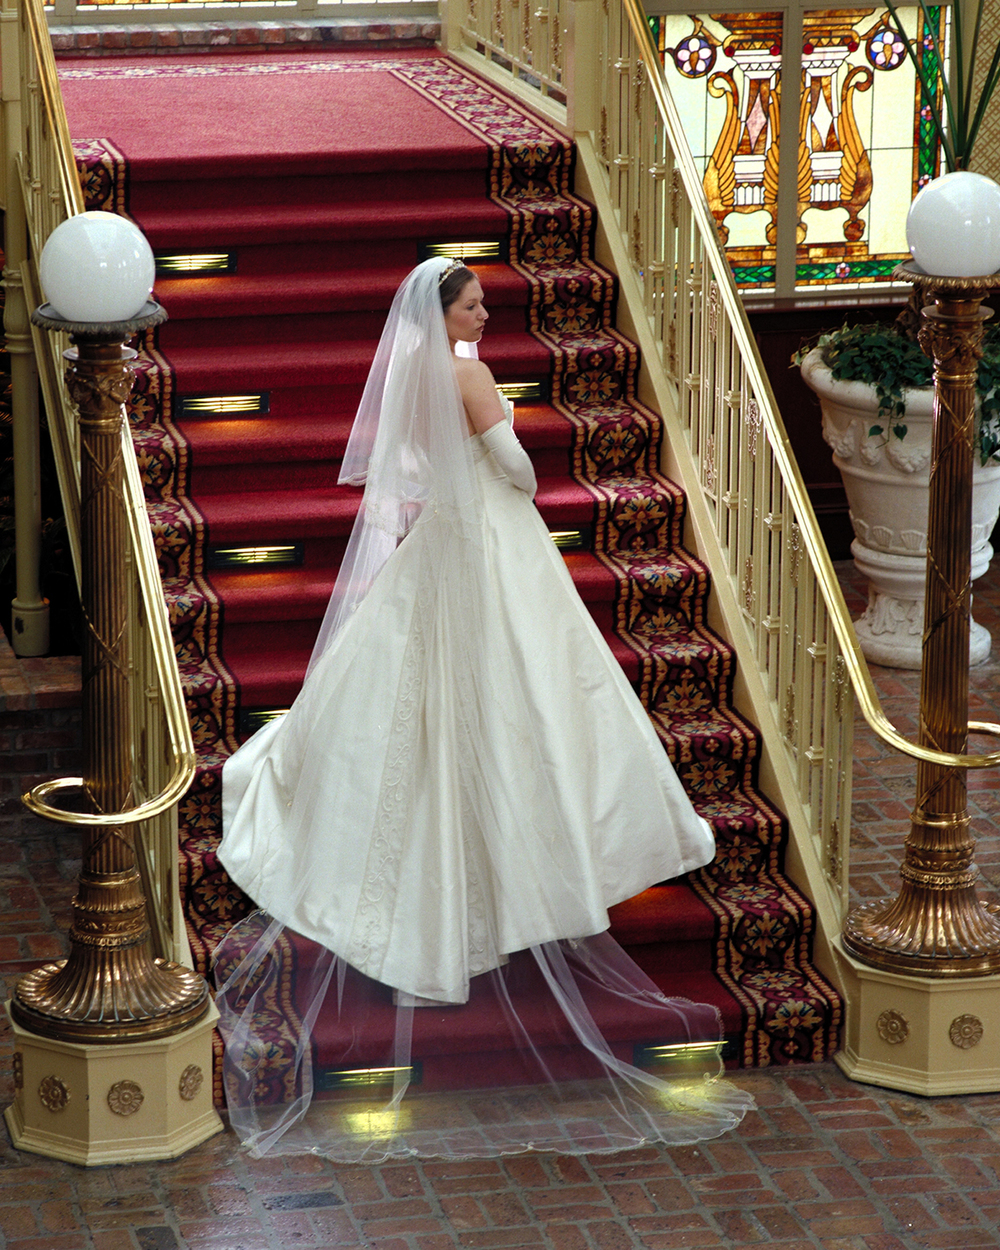 Rick-Ferro-Bride-Staircase-Orlando.jpg